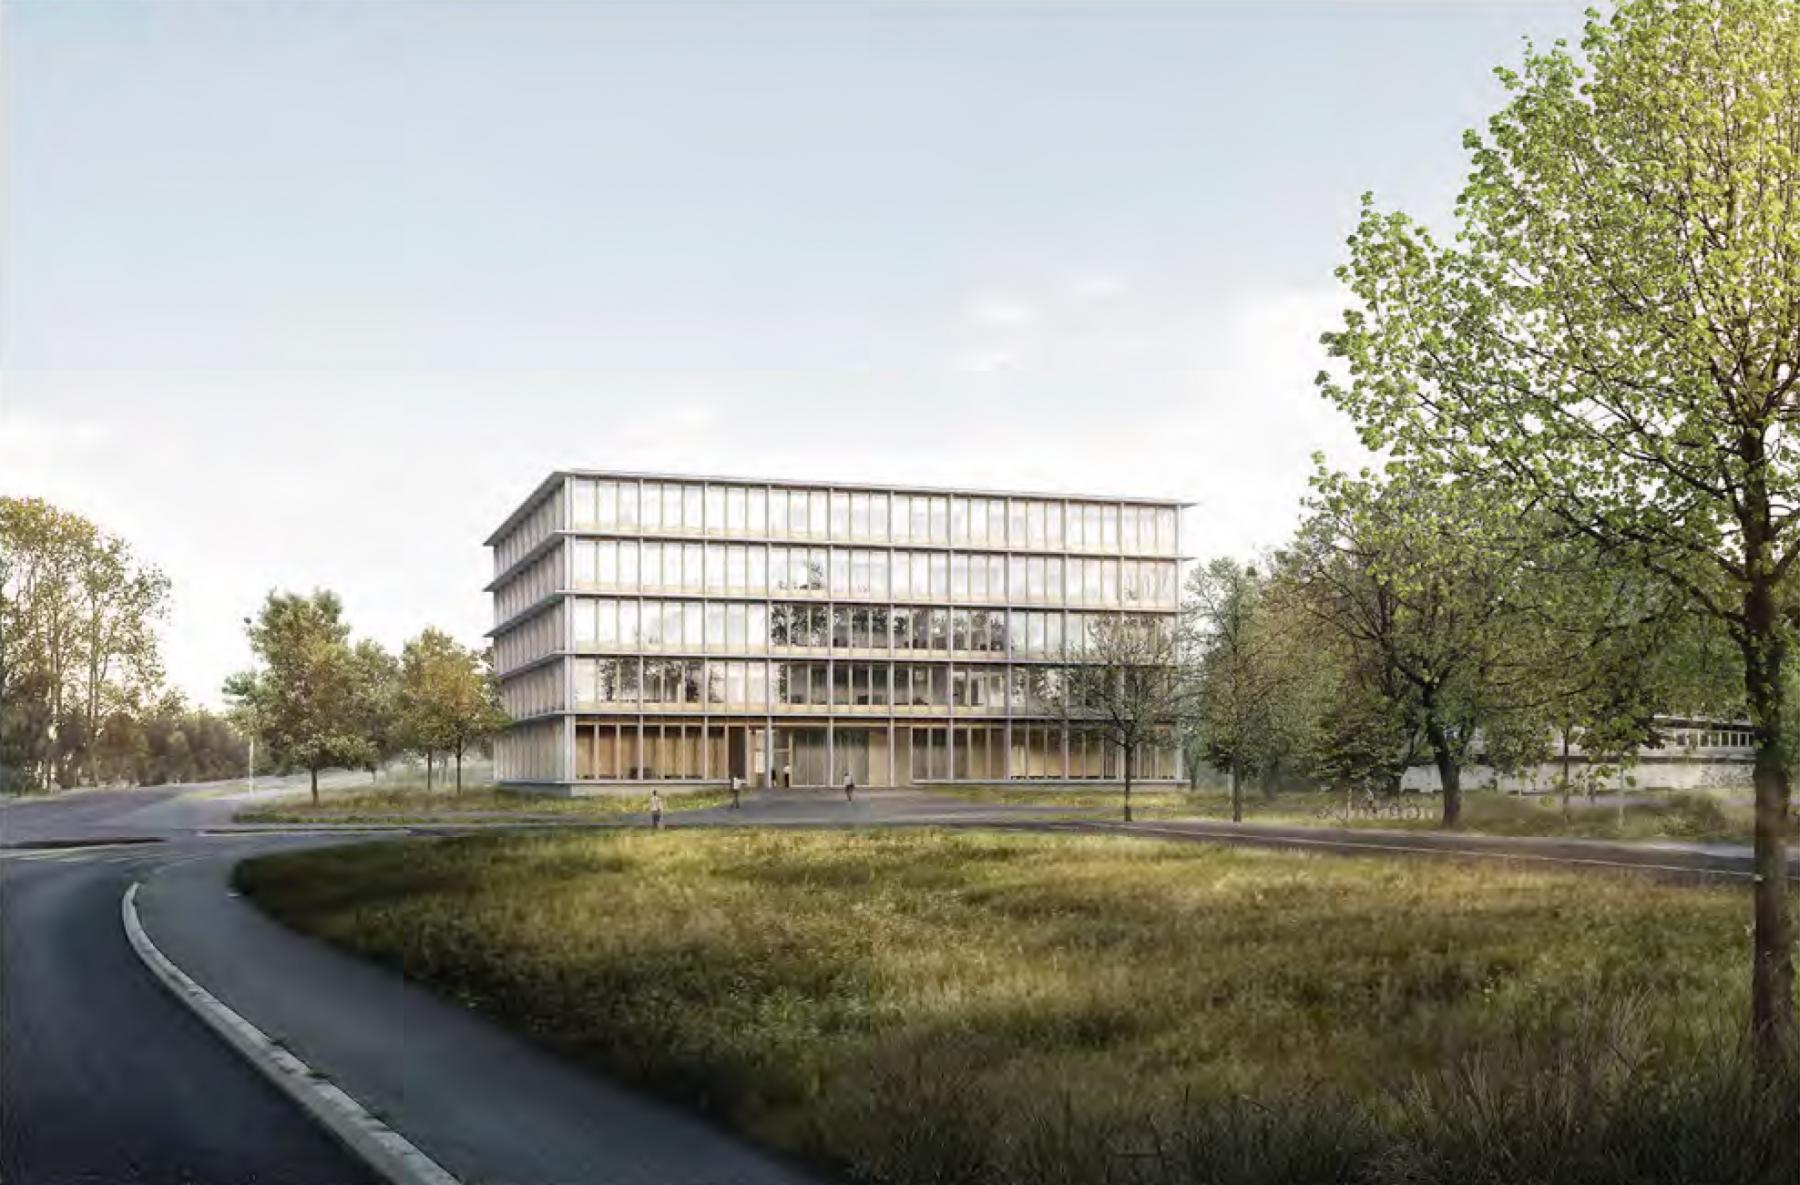 «Cluster sport international» (Synathlon), Université de Lausanne, Ecublens, KARAMUK * KUO ARCHITEKTEN, LA RUCHE